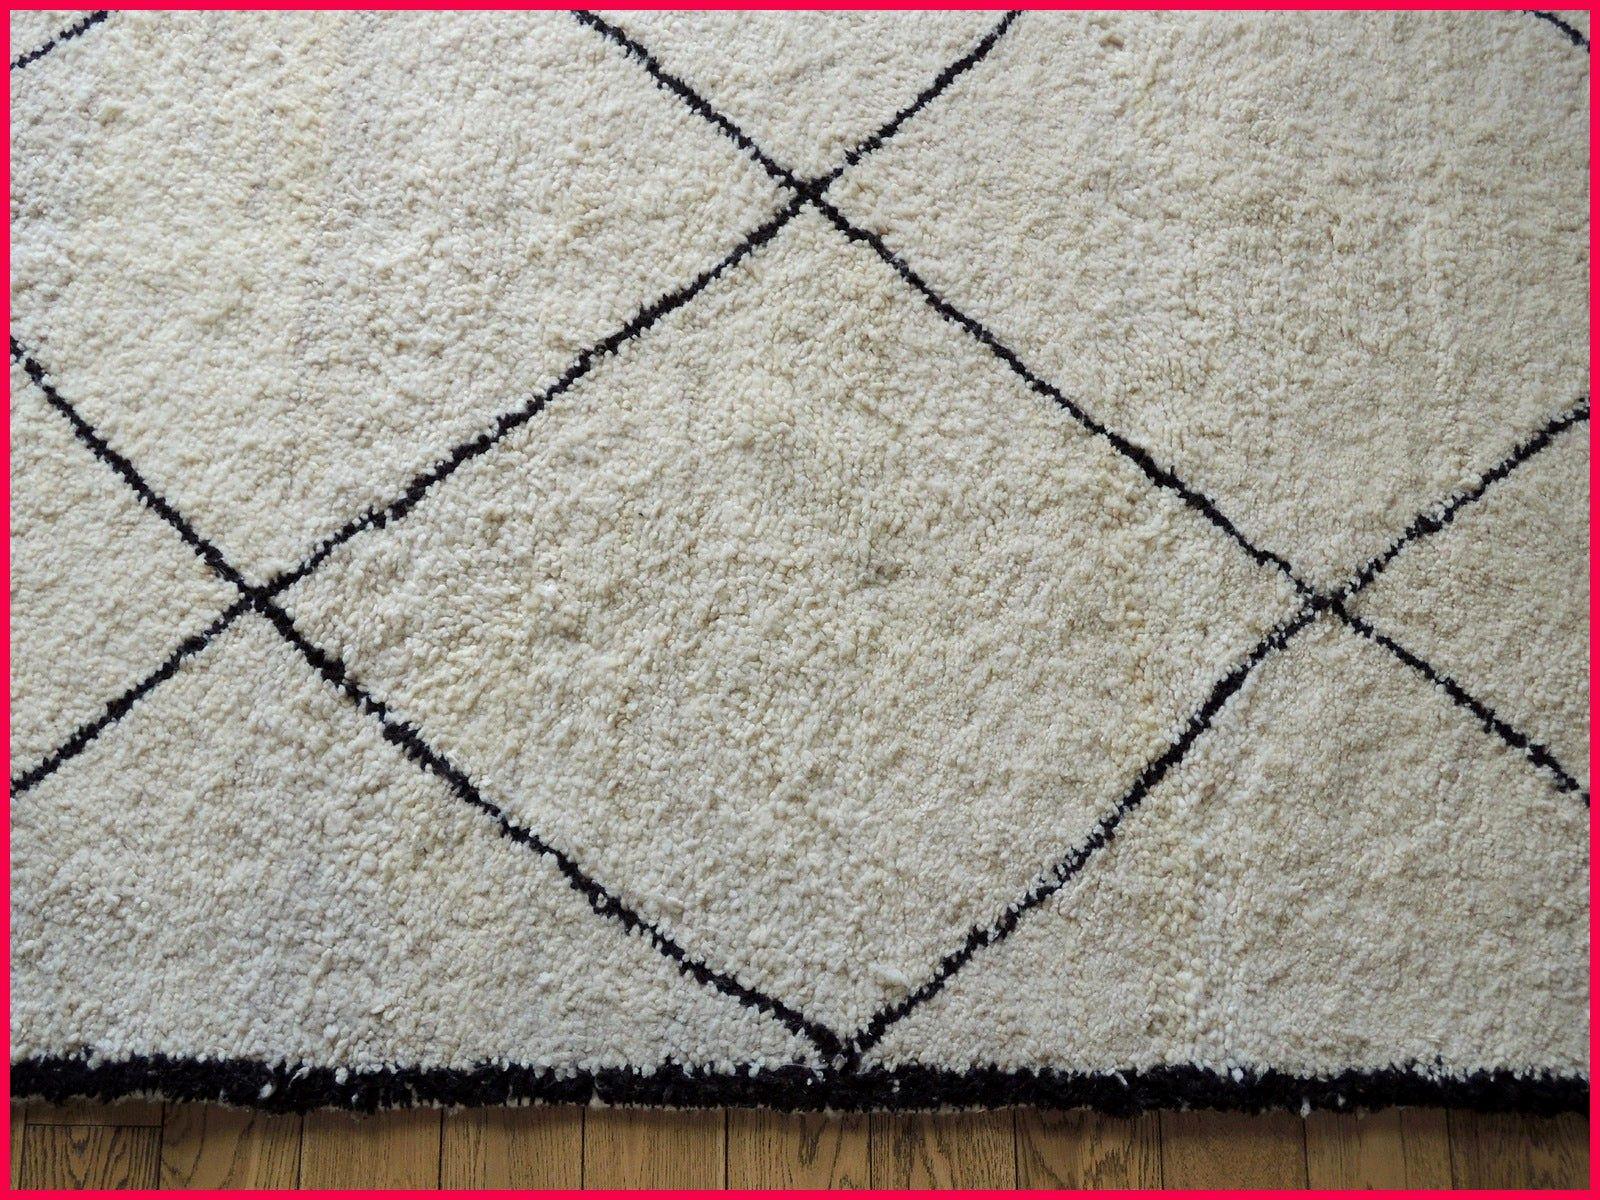 tapis berbere castorama inspirant 30 genial de tapis exterieur castorama of tapis berbere castorama